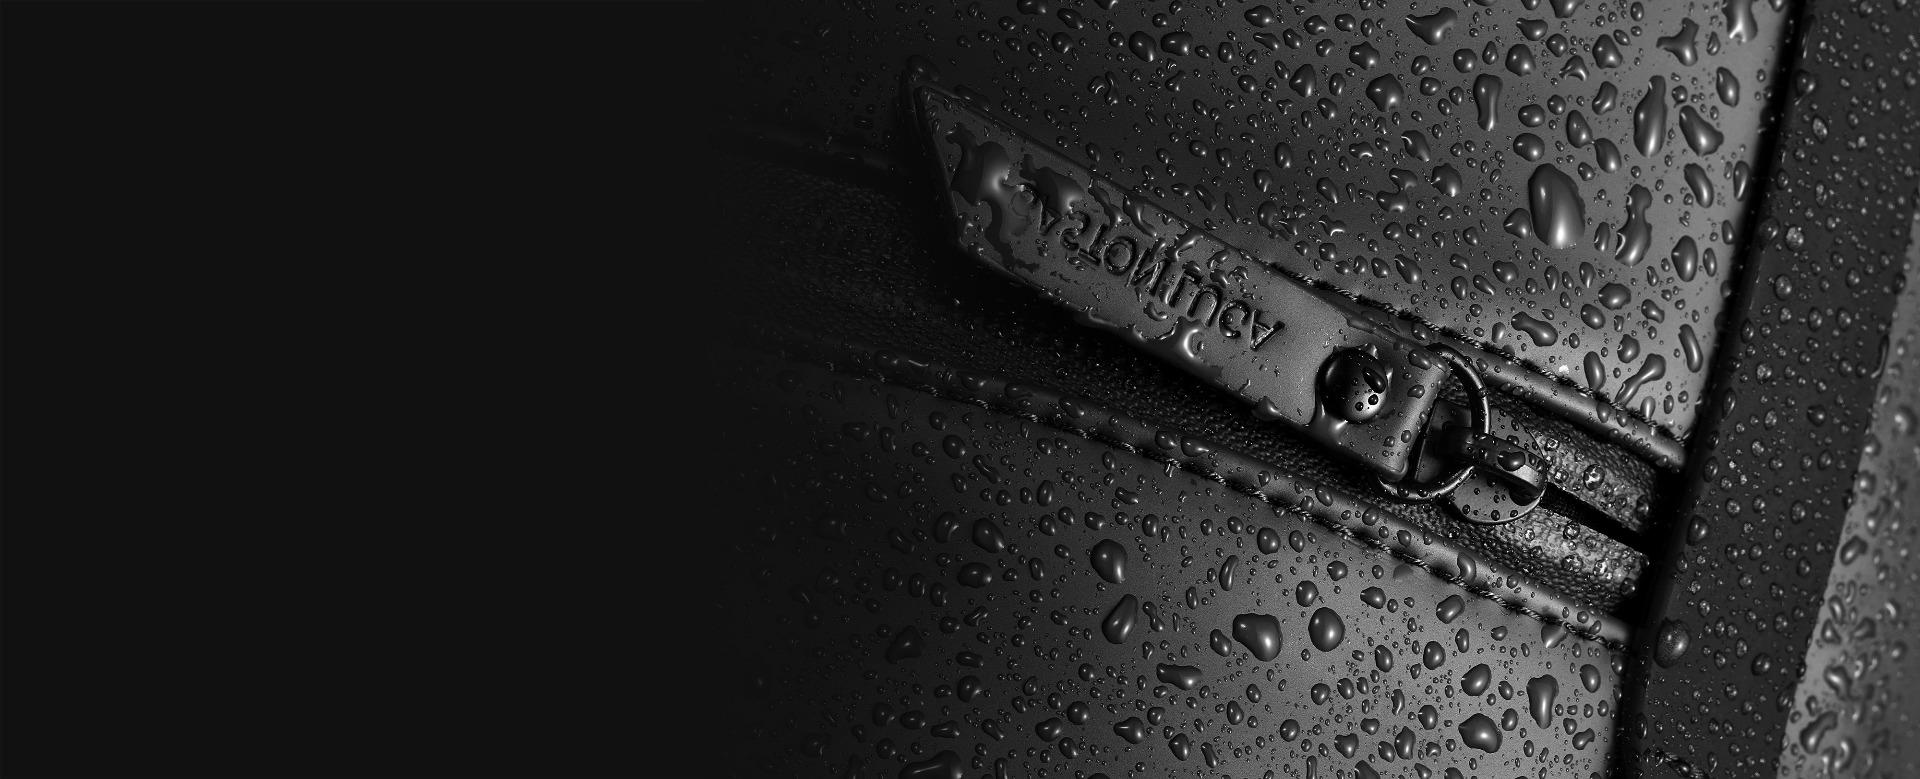 Waterproof material